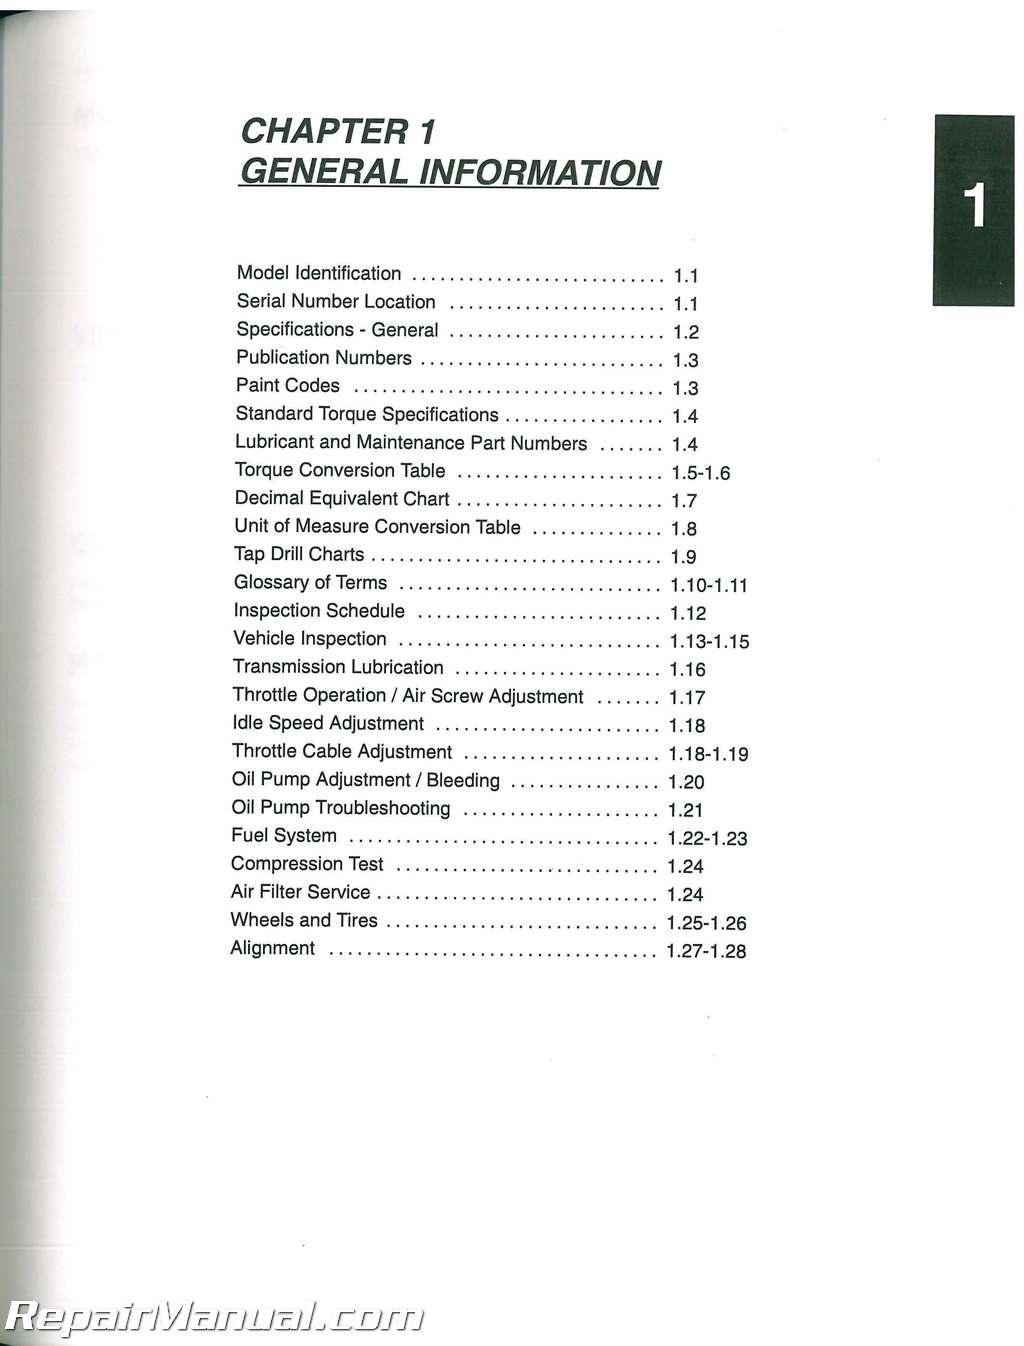 2001 polaris scrambler 50 90 sportsman 90 atv service manual rh repairmanual com polaris sportsman 90 manual choke conversion 2001 polaris sportsman 90 service manual pdf